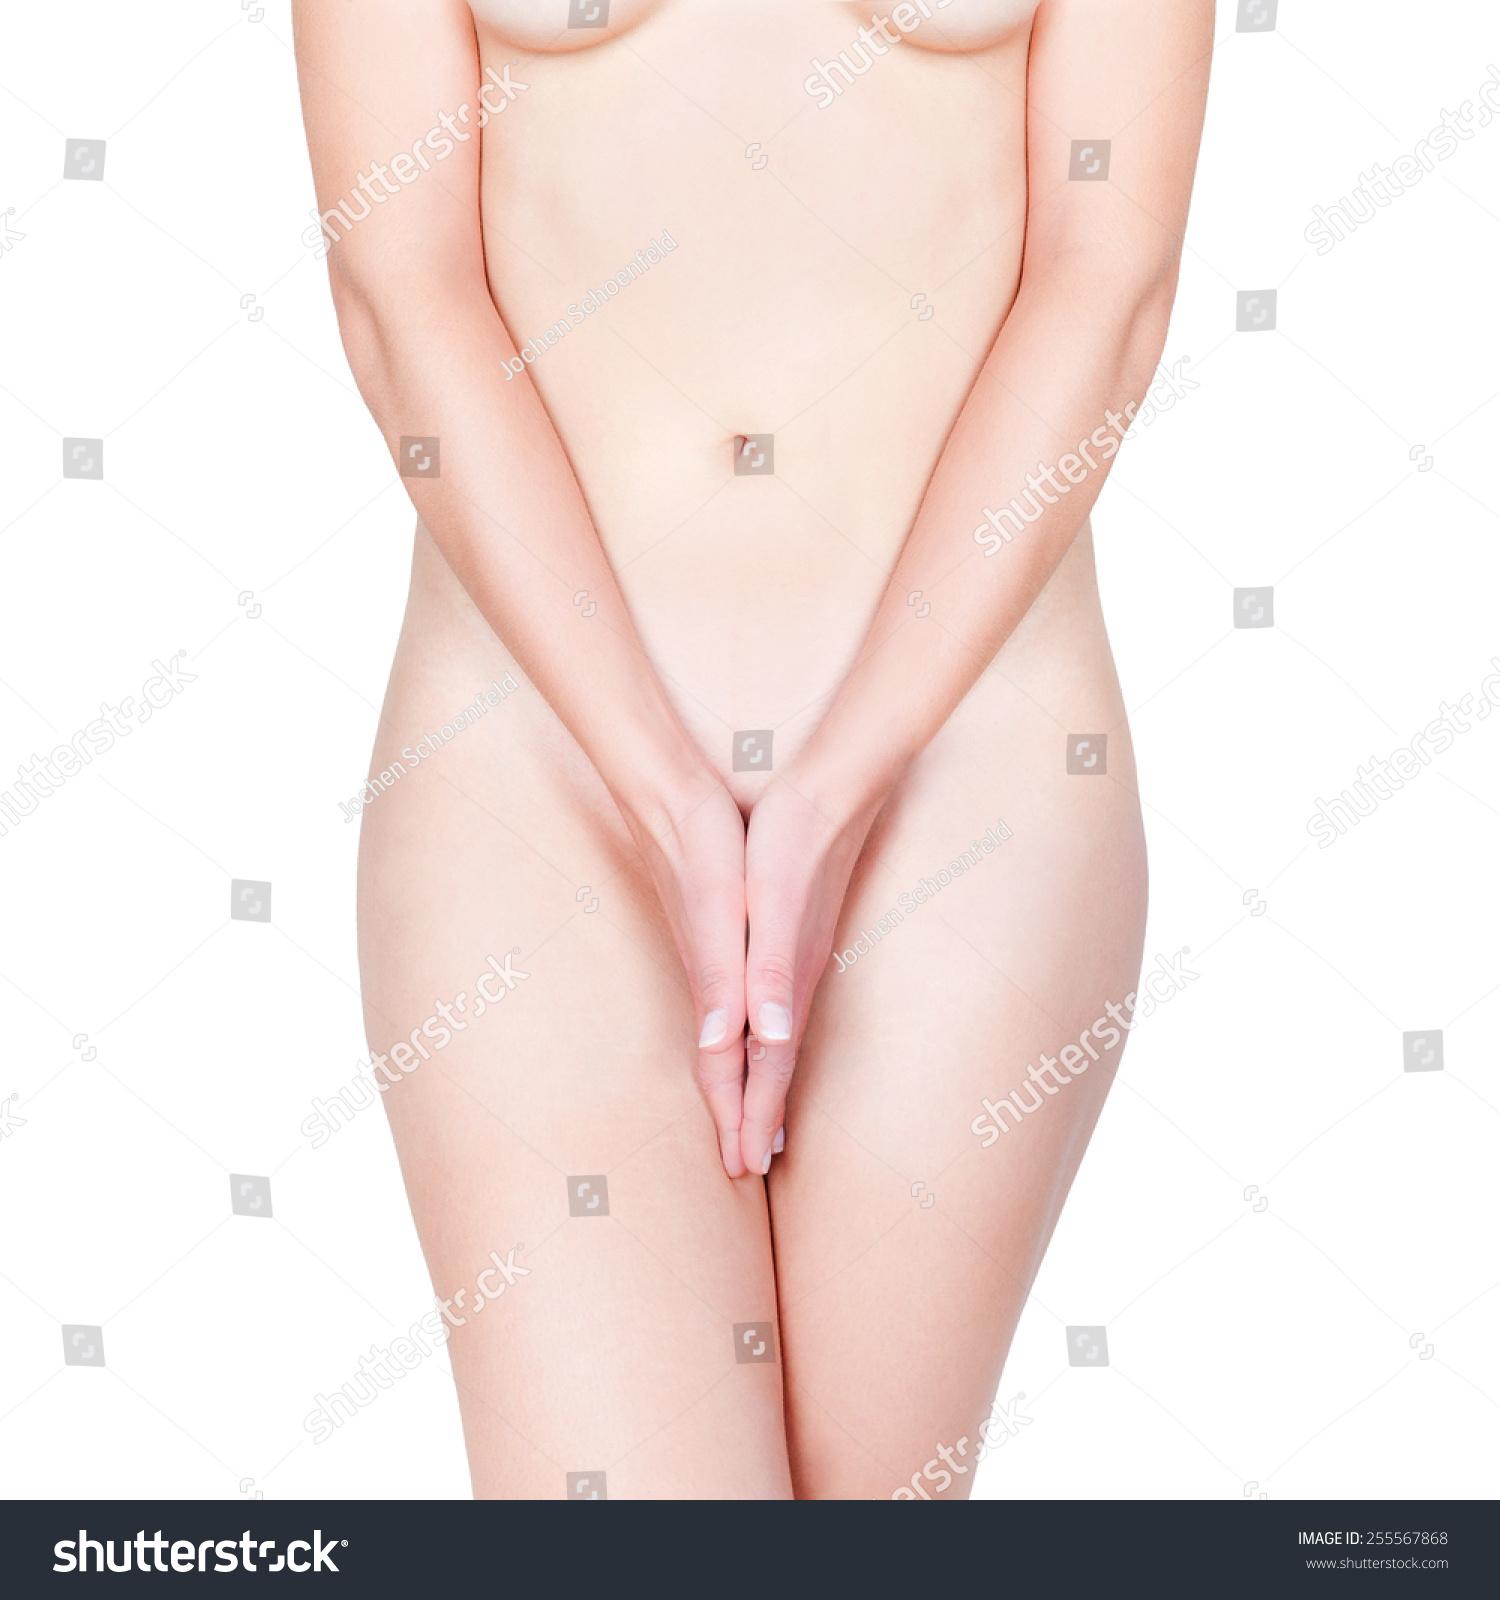 nude woman closeups pic free Adult